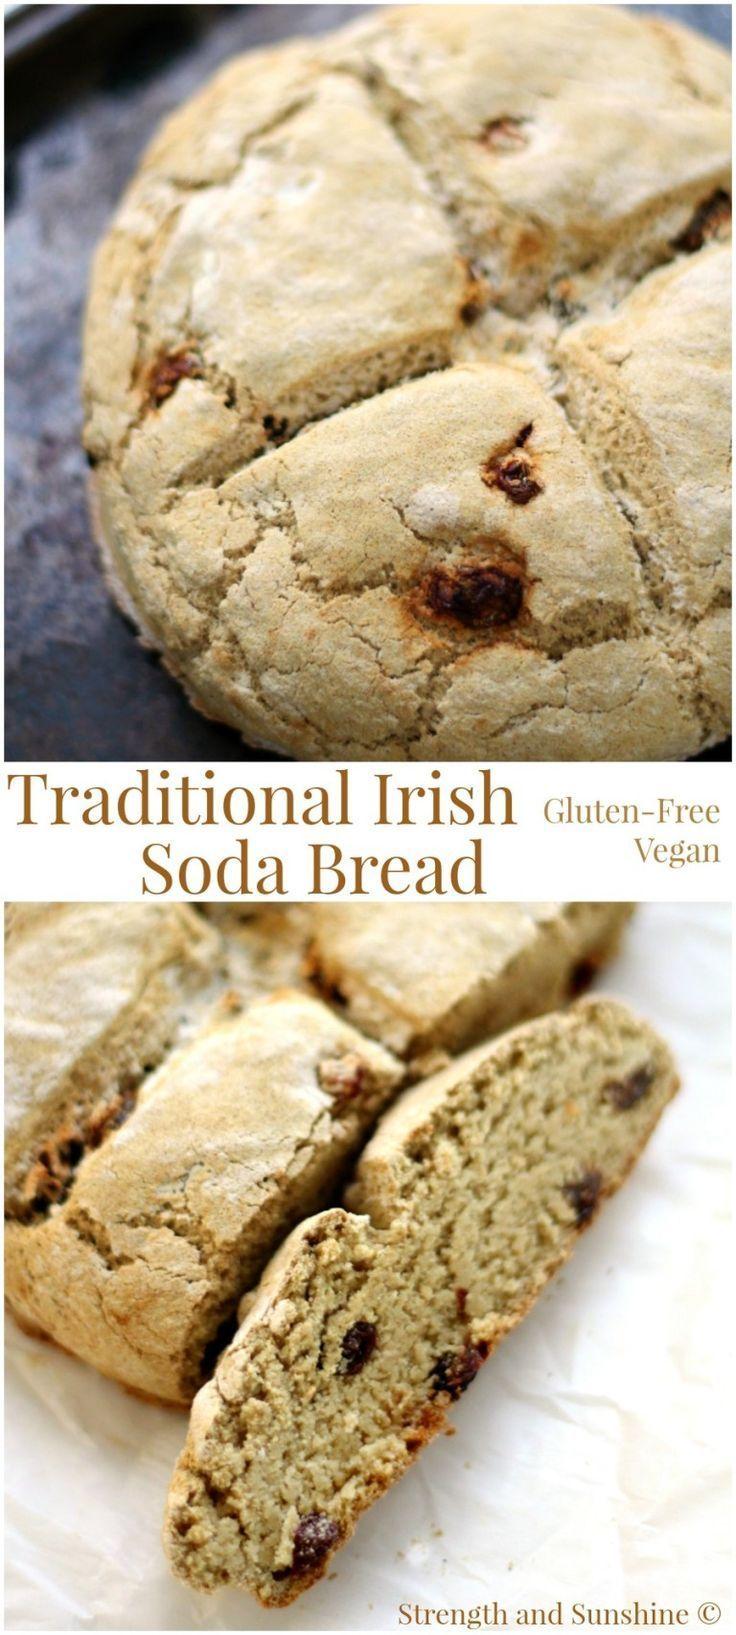 Irish Soda Bread (Glutenfree/Vegan) with Amaranth, Millet